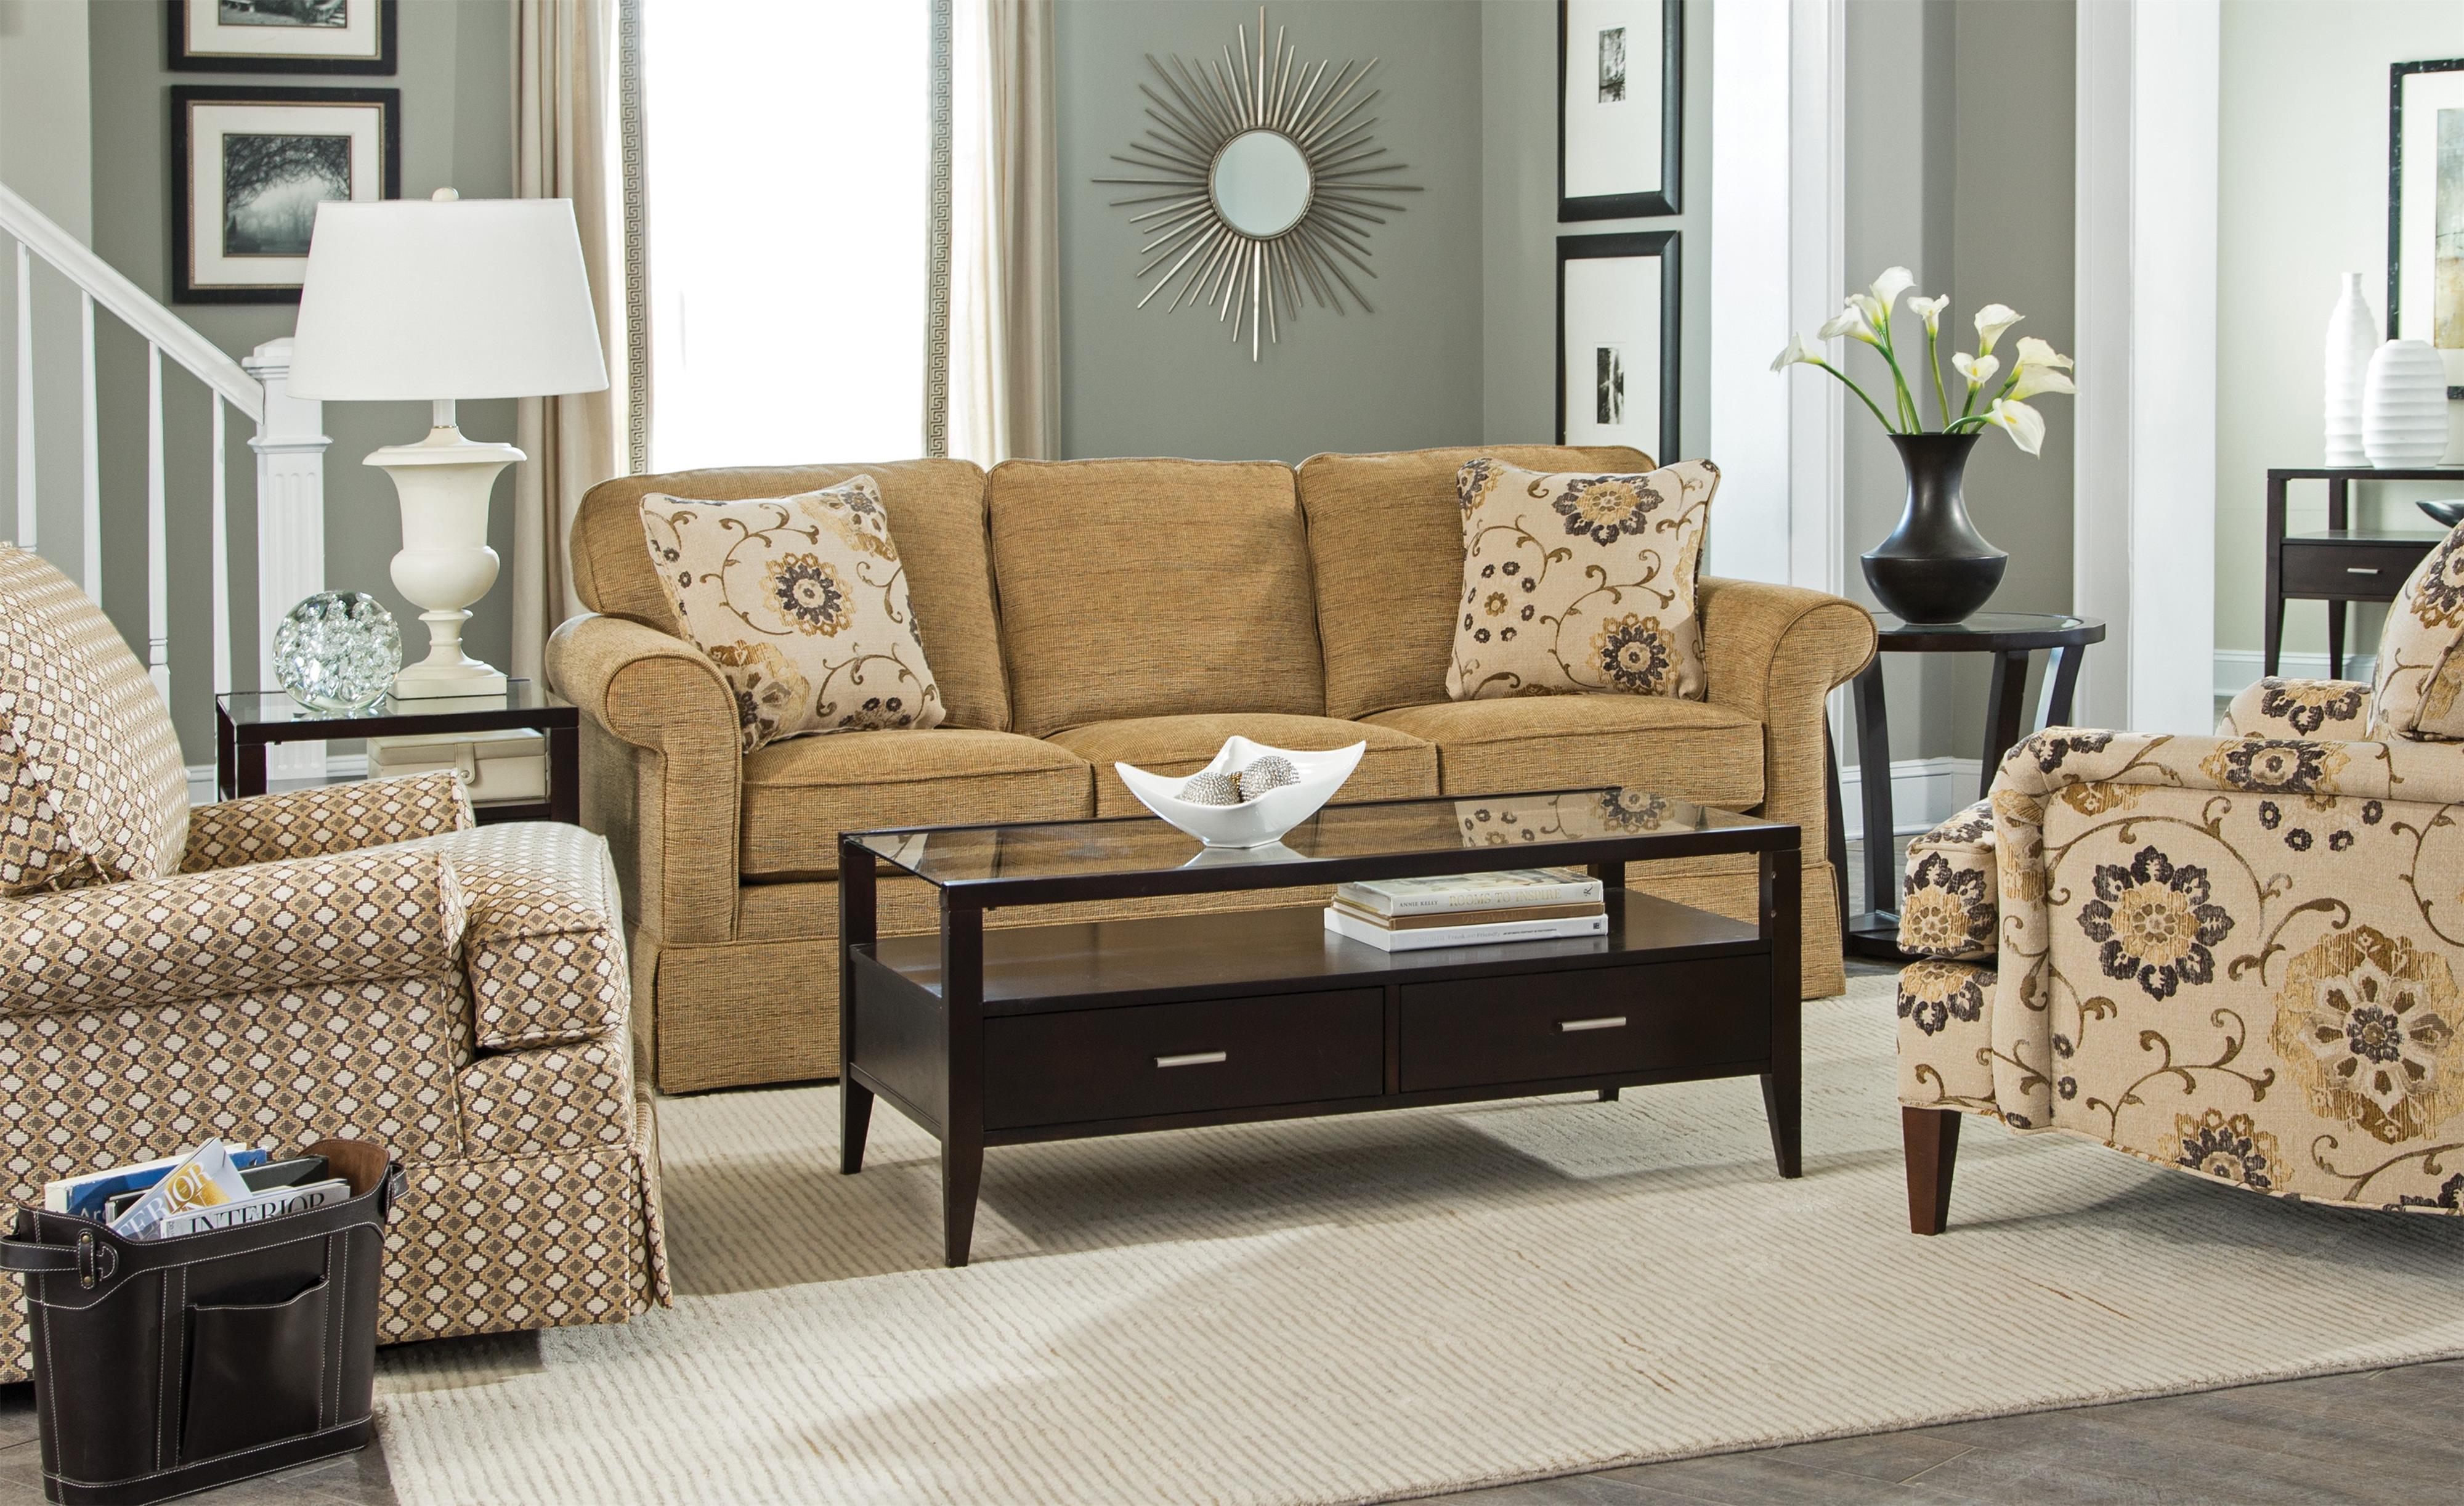 Craftmaster 9438 Traditional Sleeper Sofa With Kick Pleat